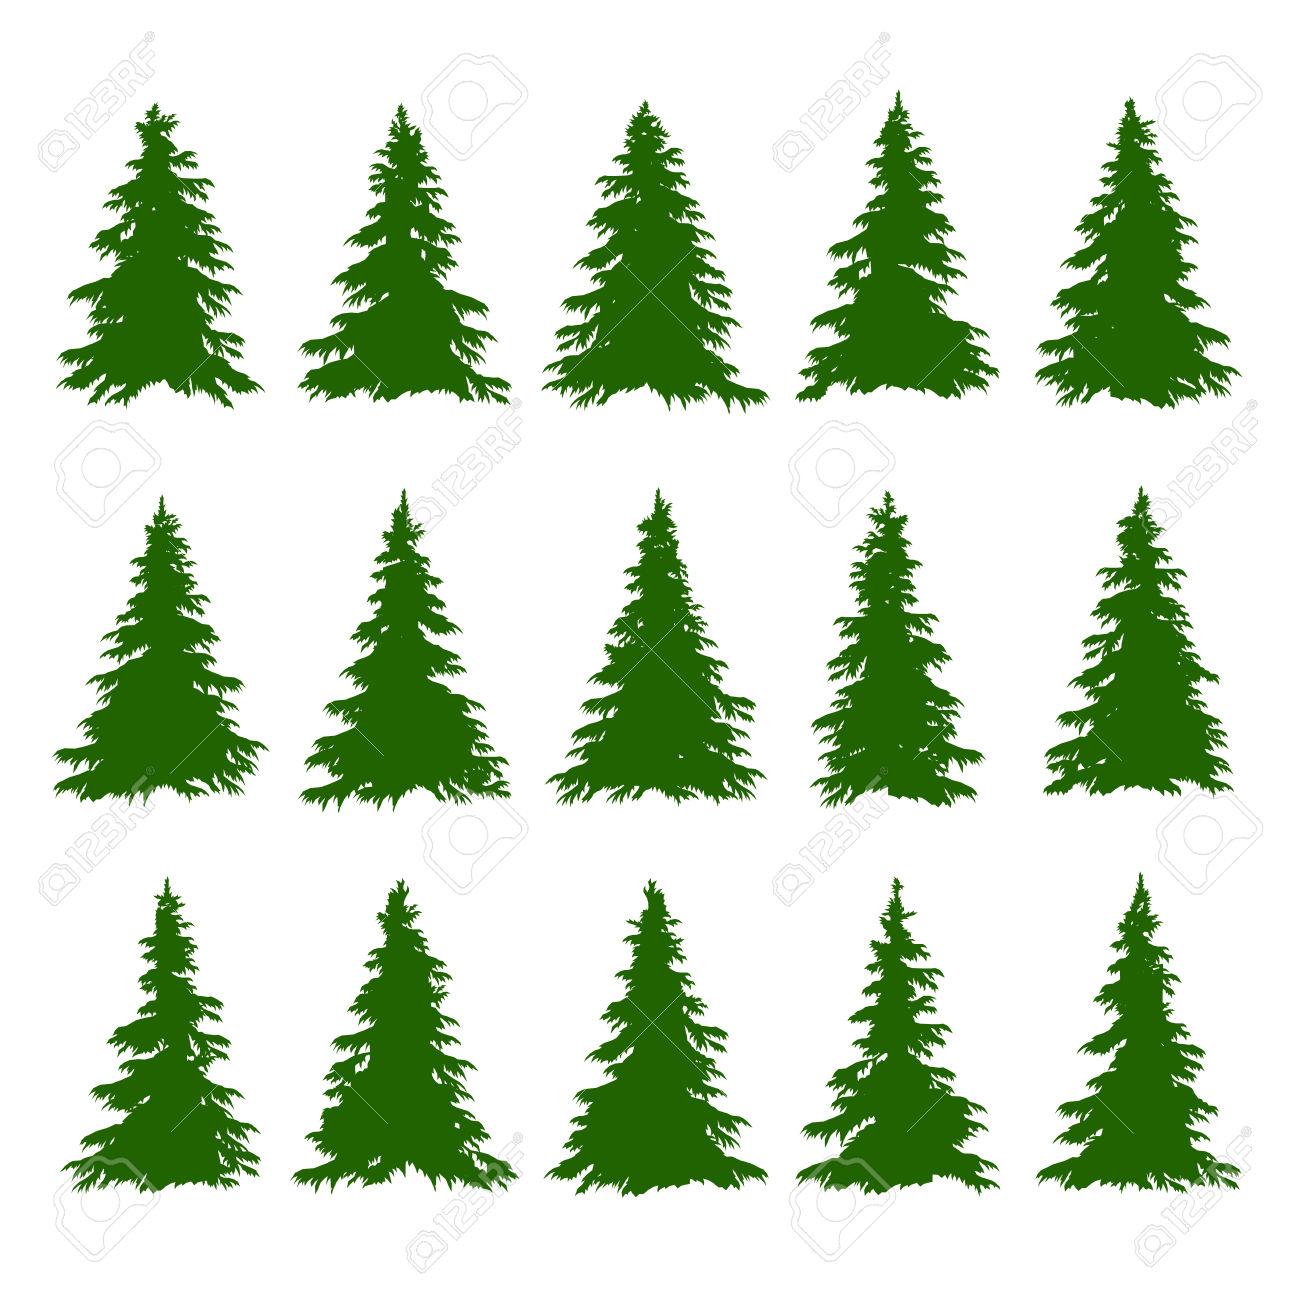 Conifer clipart.